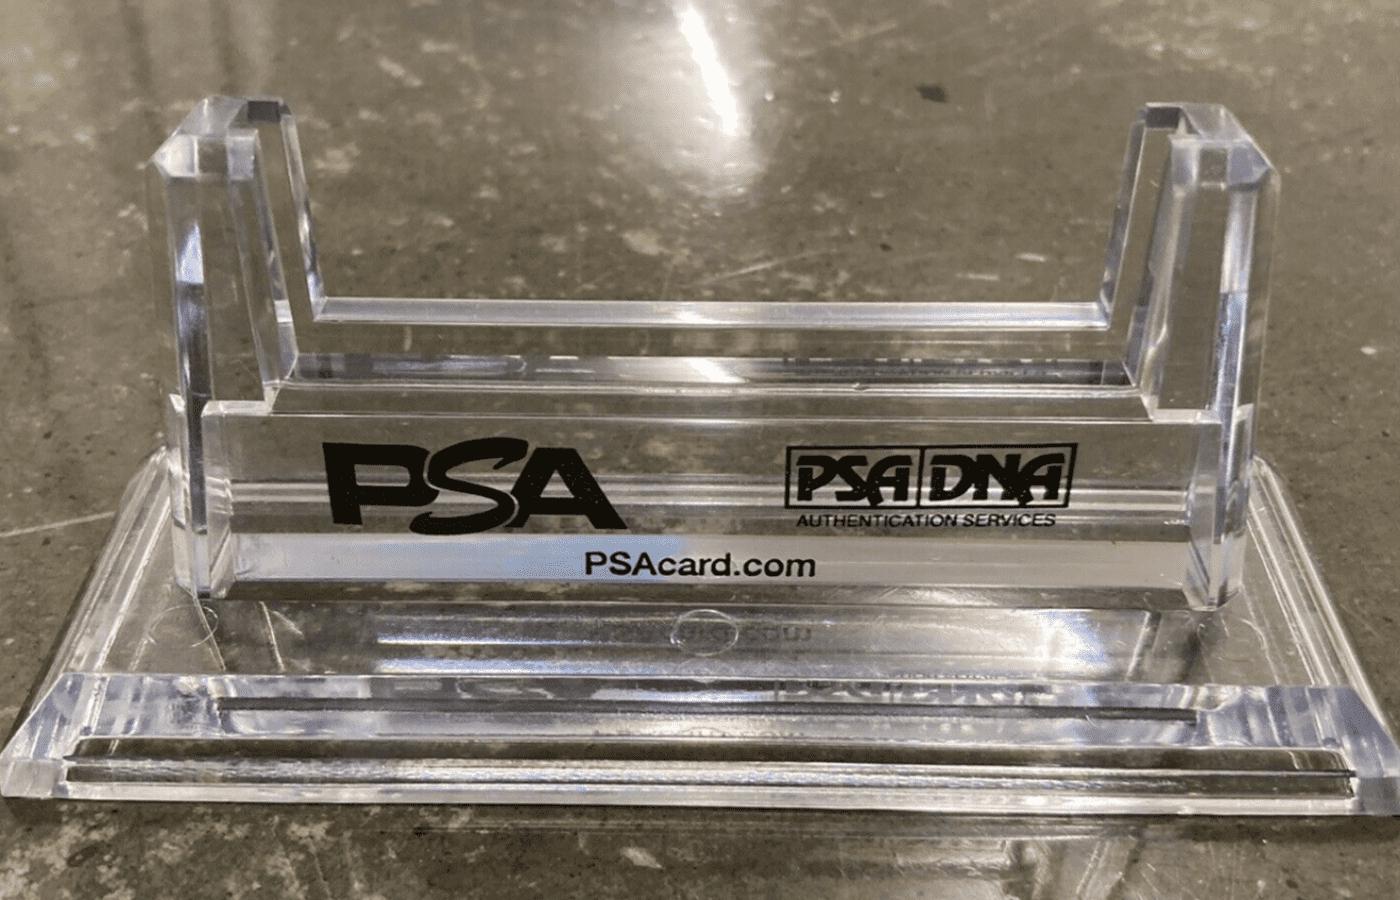 is PSA Grading Trustworthy